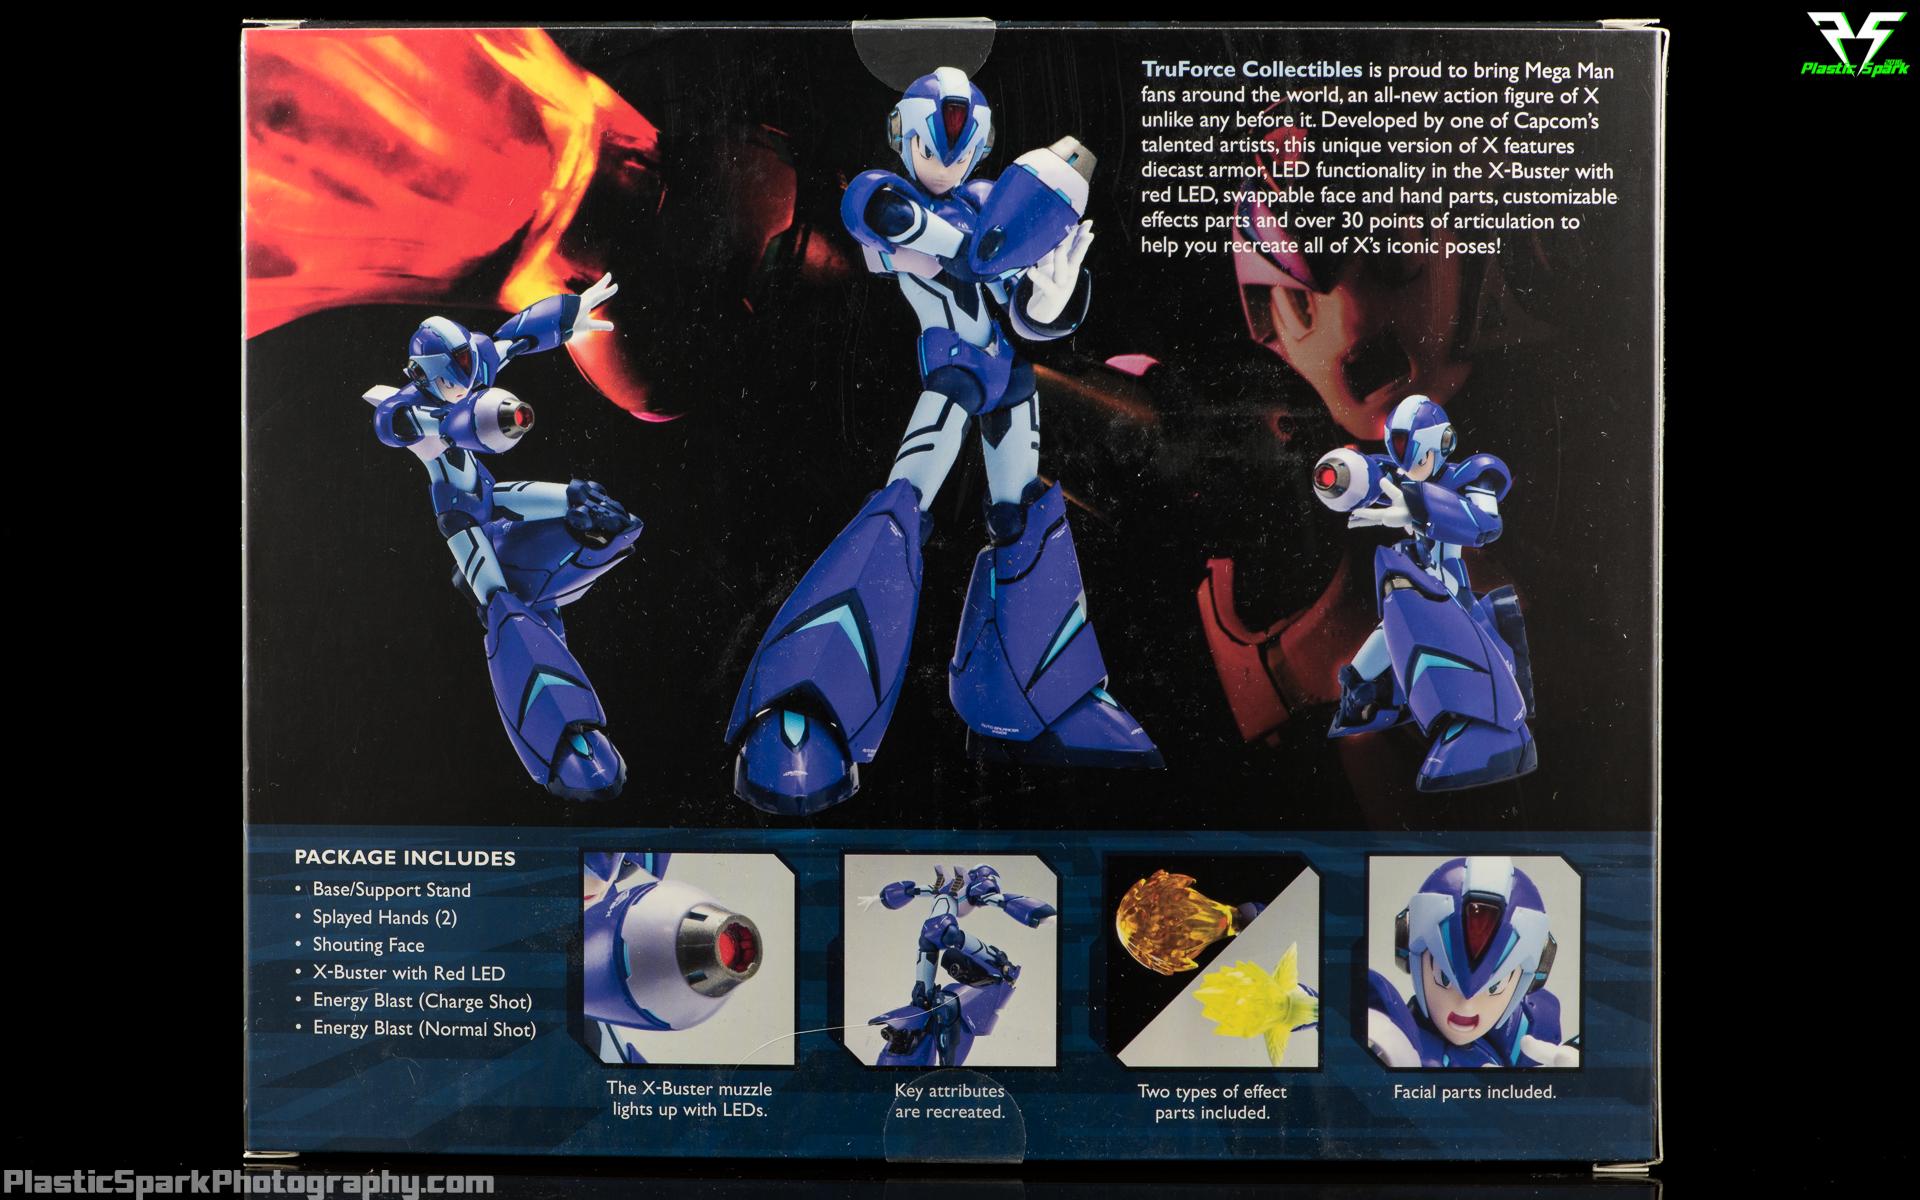 Truforce-Megaman-X-Packaging-(1-of-6).png